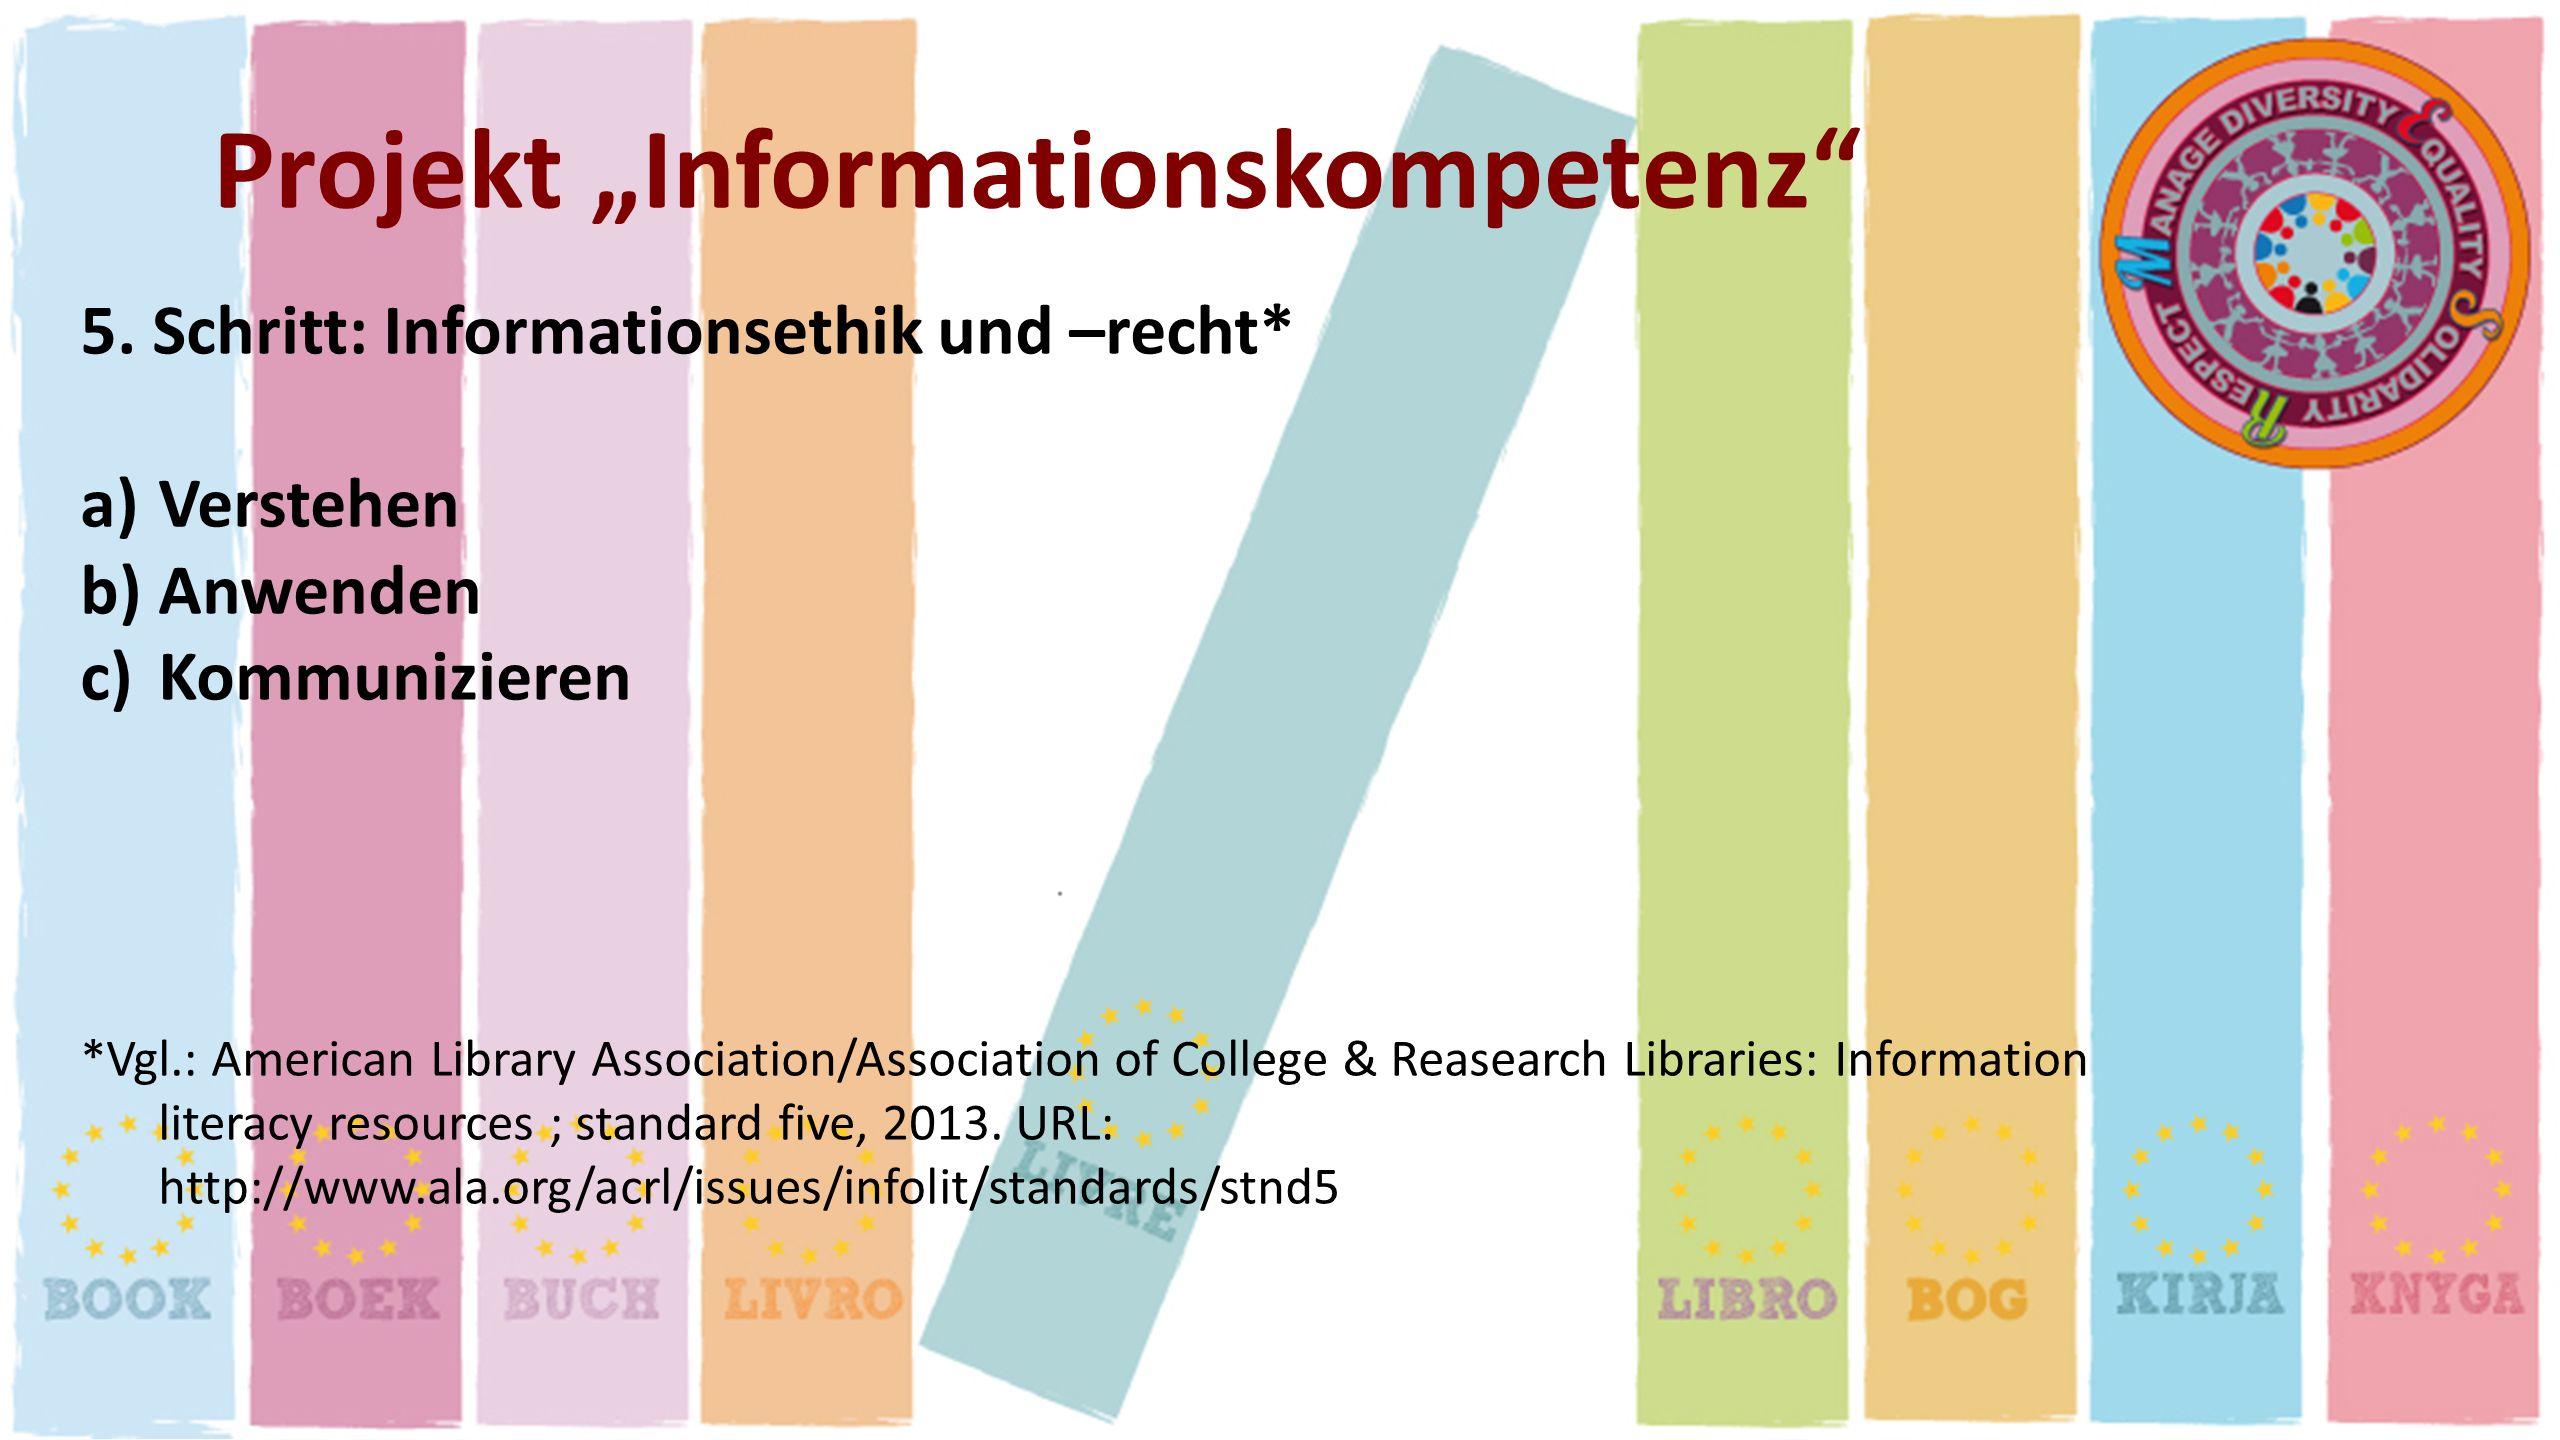 Projekt Informationskompetenz 5. Schritt: Informationsethik und –recht* a)Verstehen b)Anwenden c)Kommunizieren *Vgl.: American Library Association/Ass